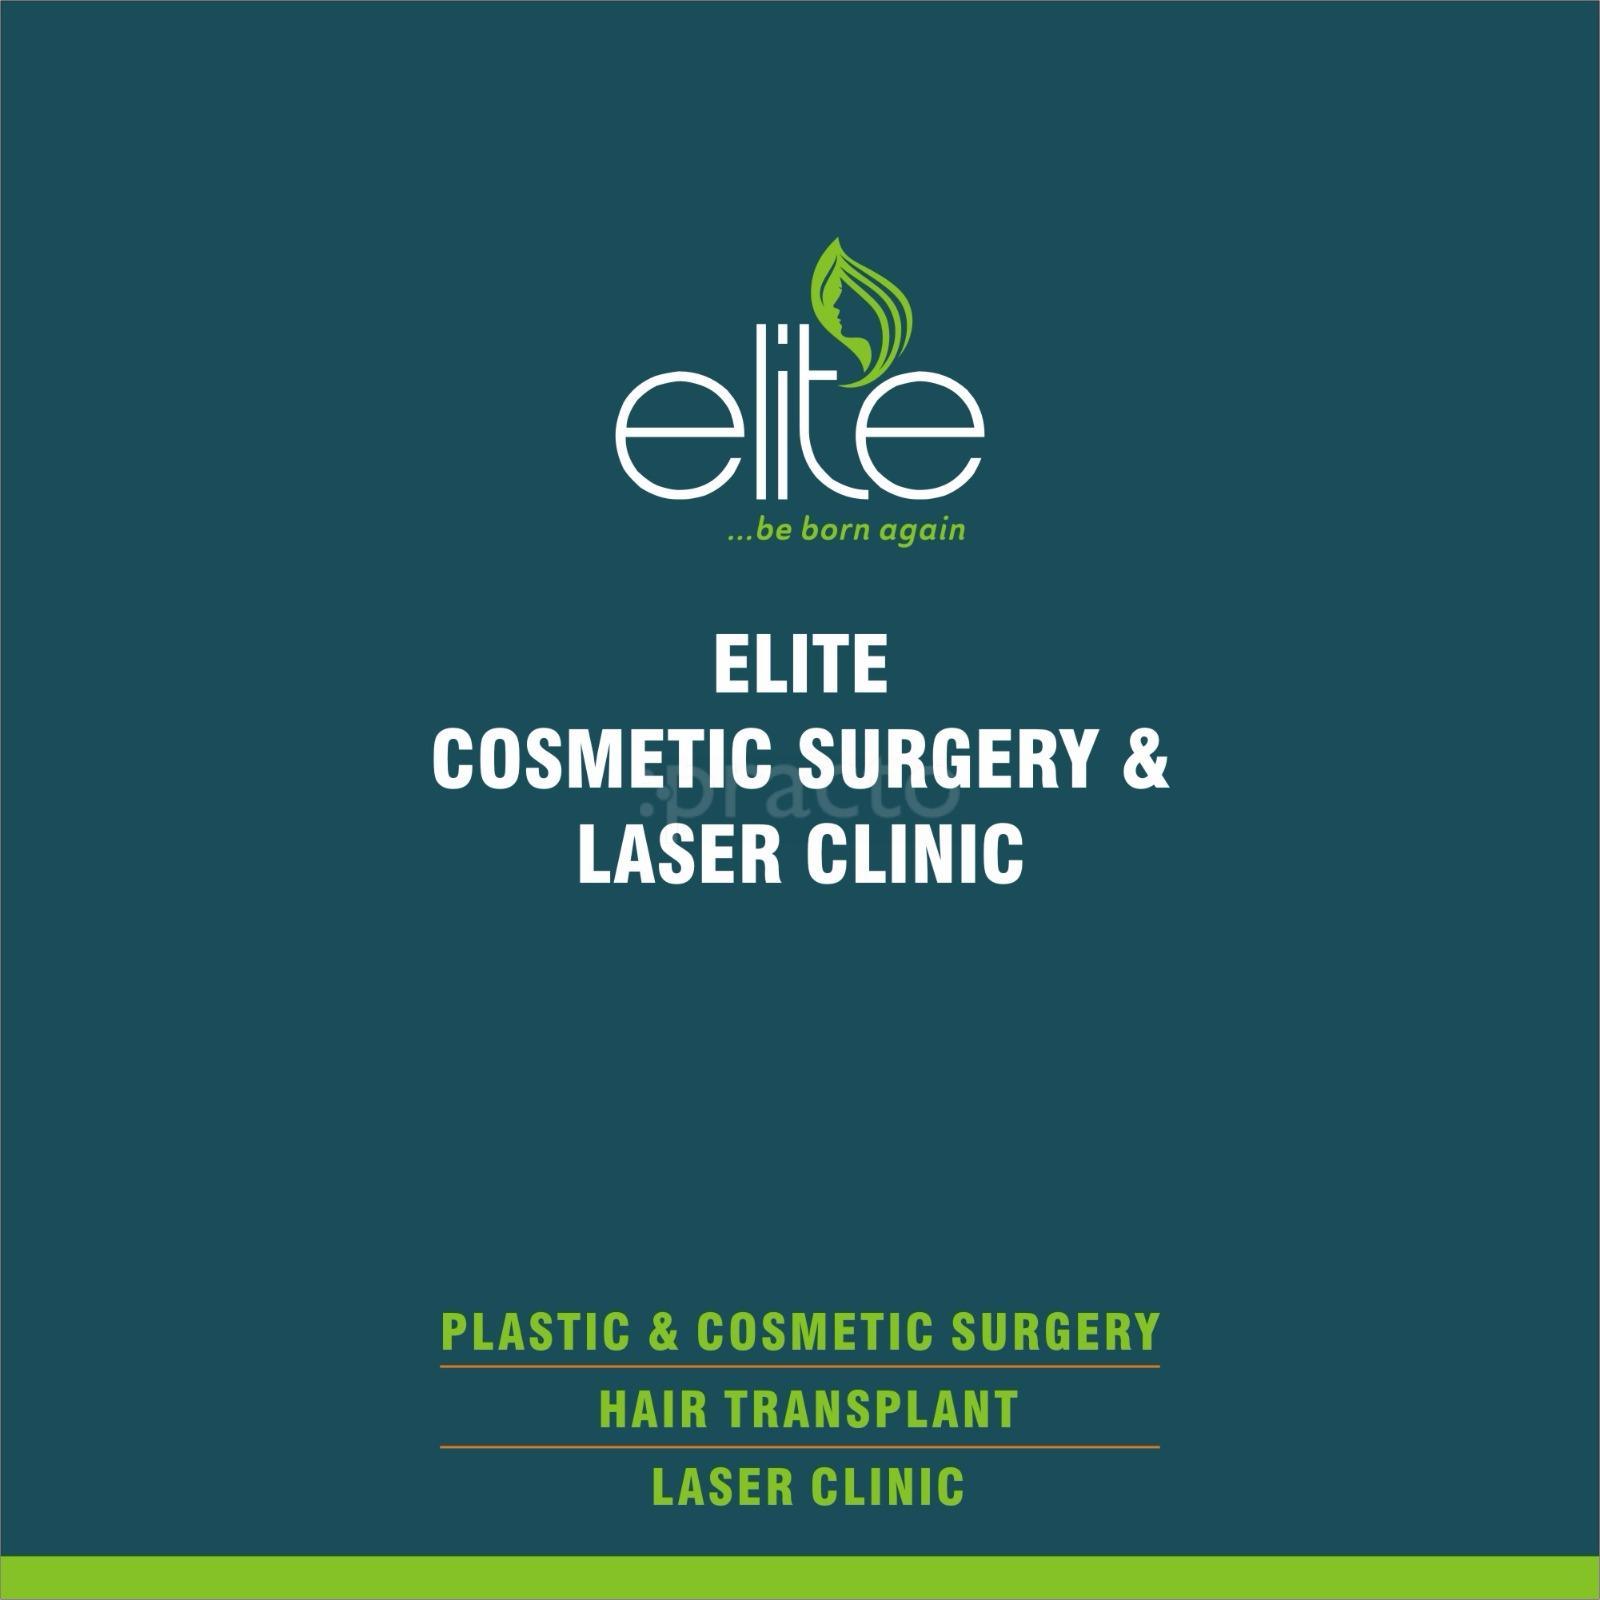 Dr Manoj Bachhav's Elite Cosmetic Surgery & Laser Clinic